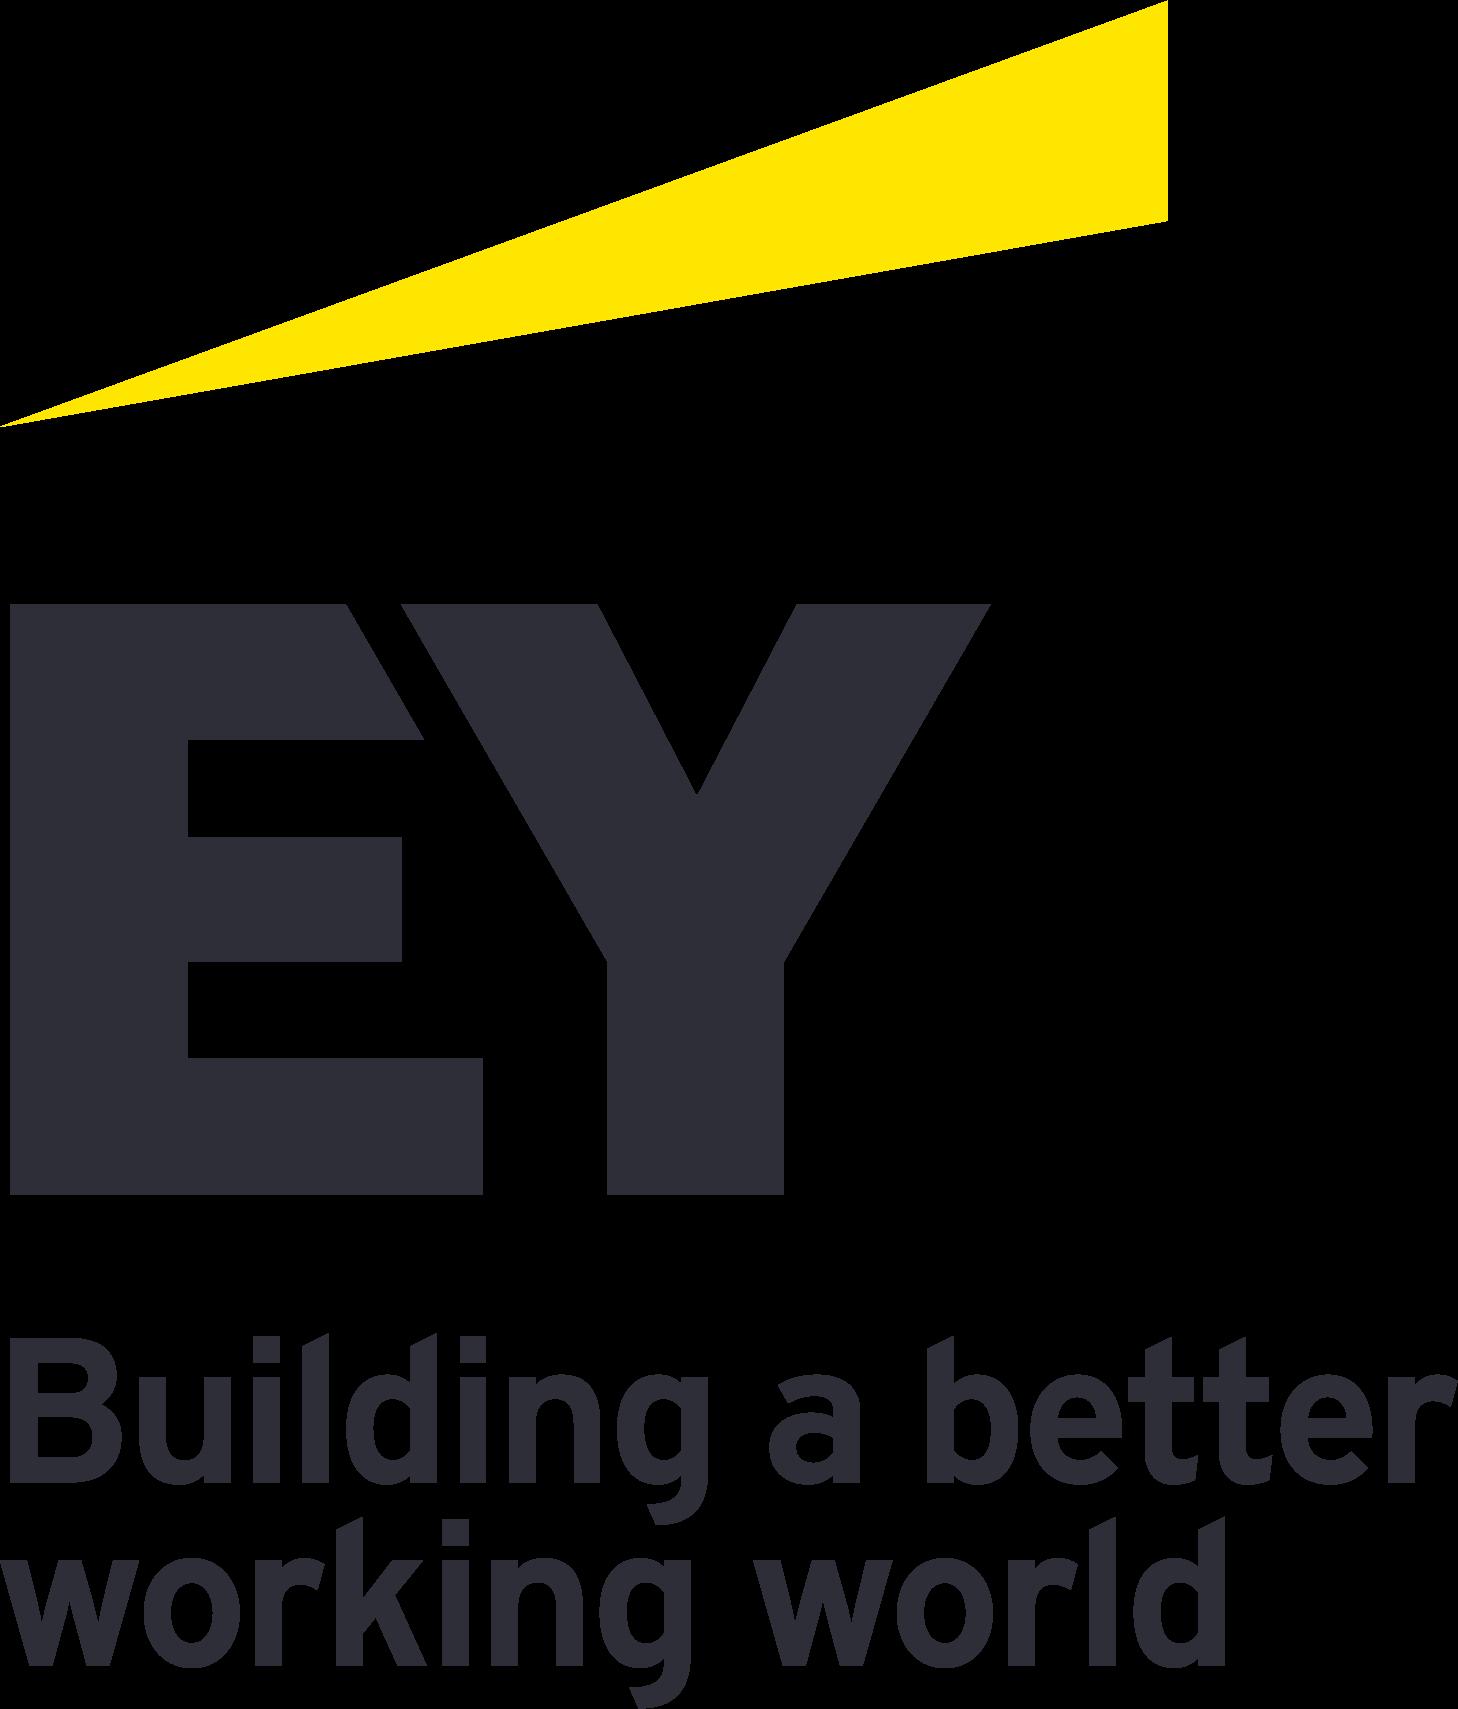 ey_logo_beam_tag_stacked_rgb_offblack_yellow.png (46 KB)